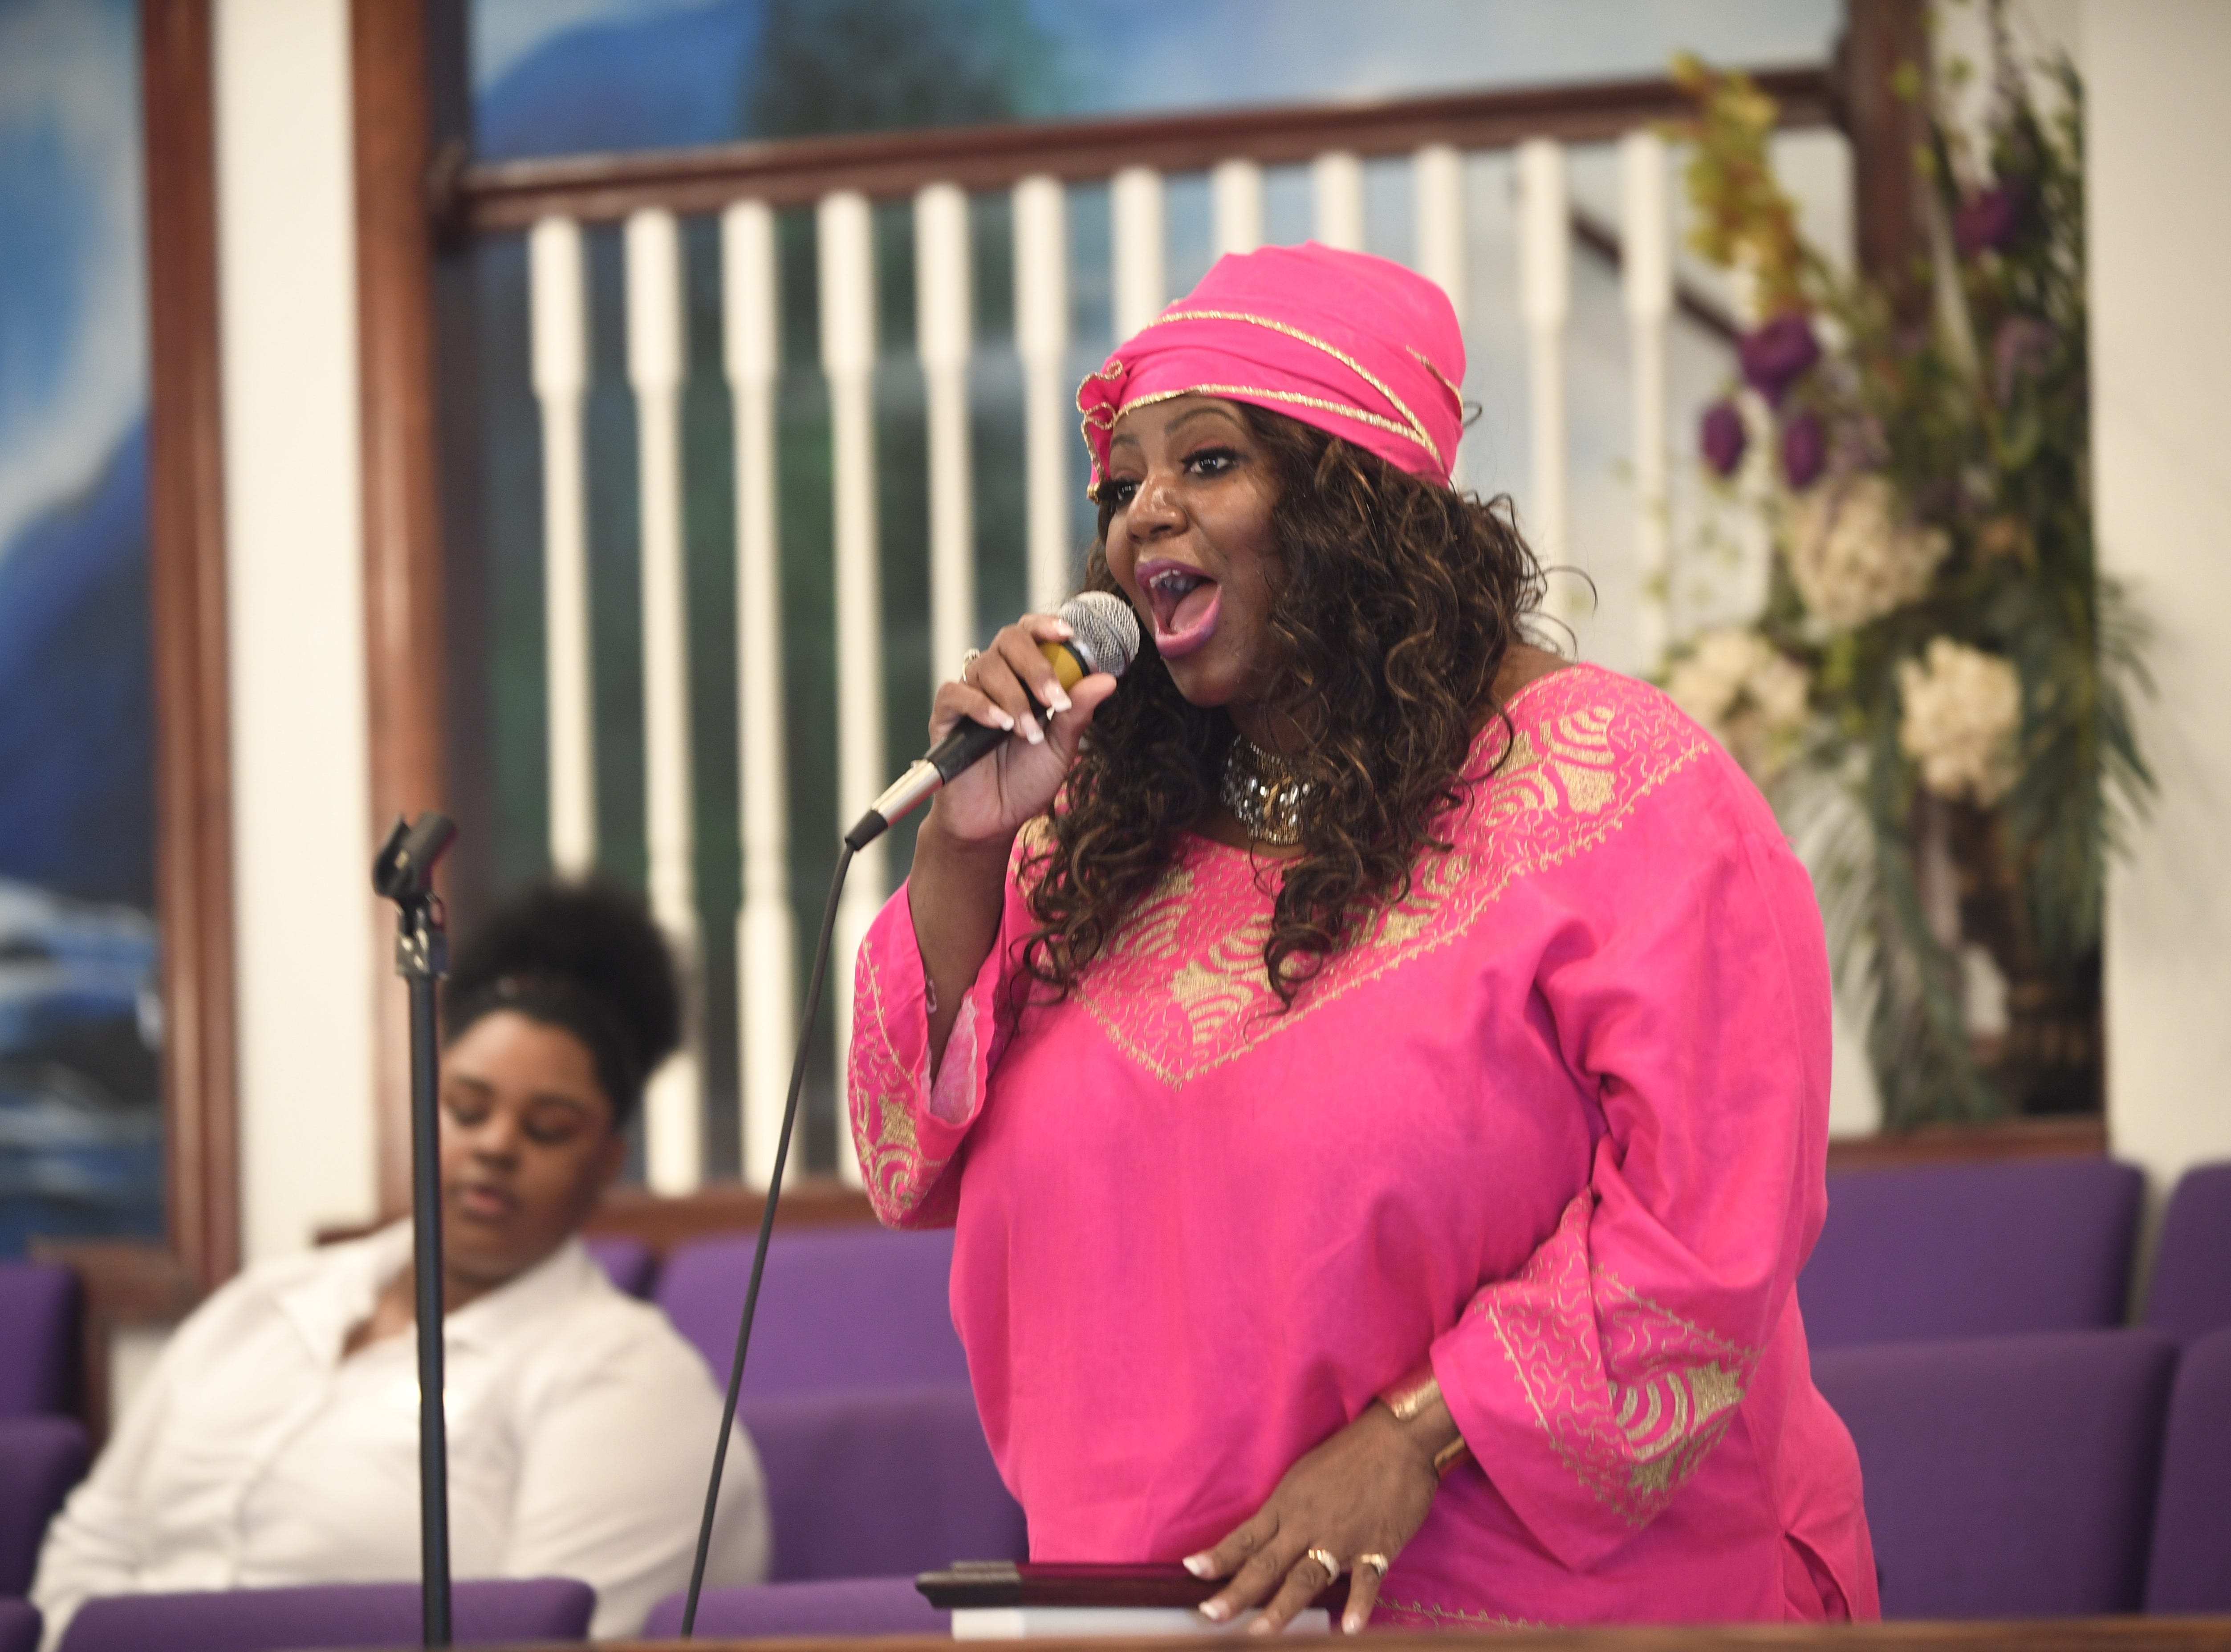 Minster Porchia Kirby sings at Mt. Pleasant Church's Black History Month event, in Pinson, Tenn. Feb 24, 2019.